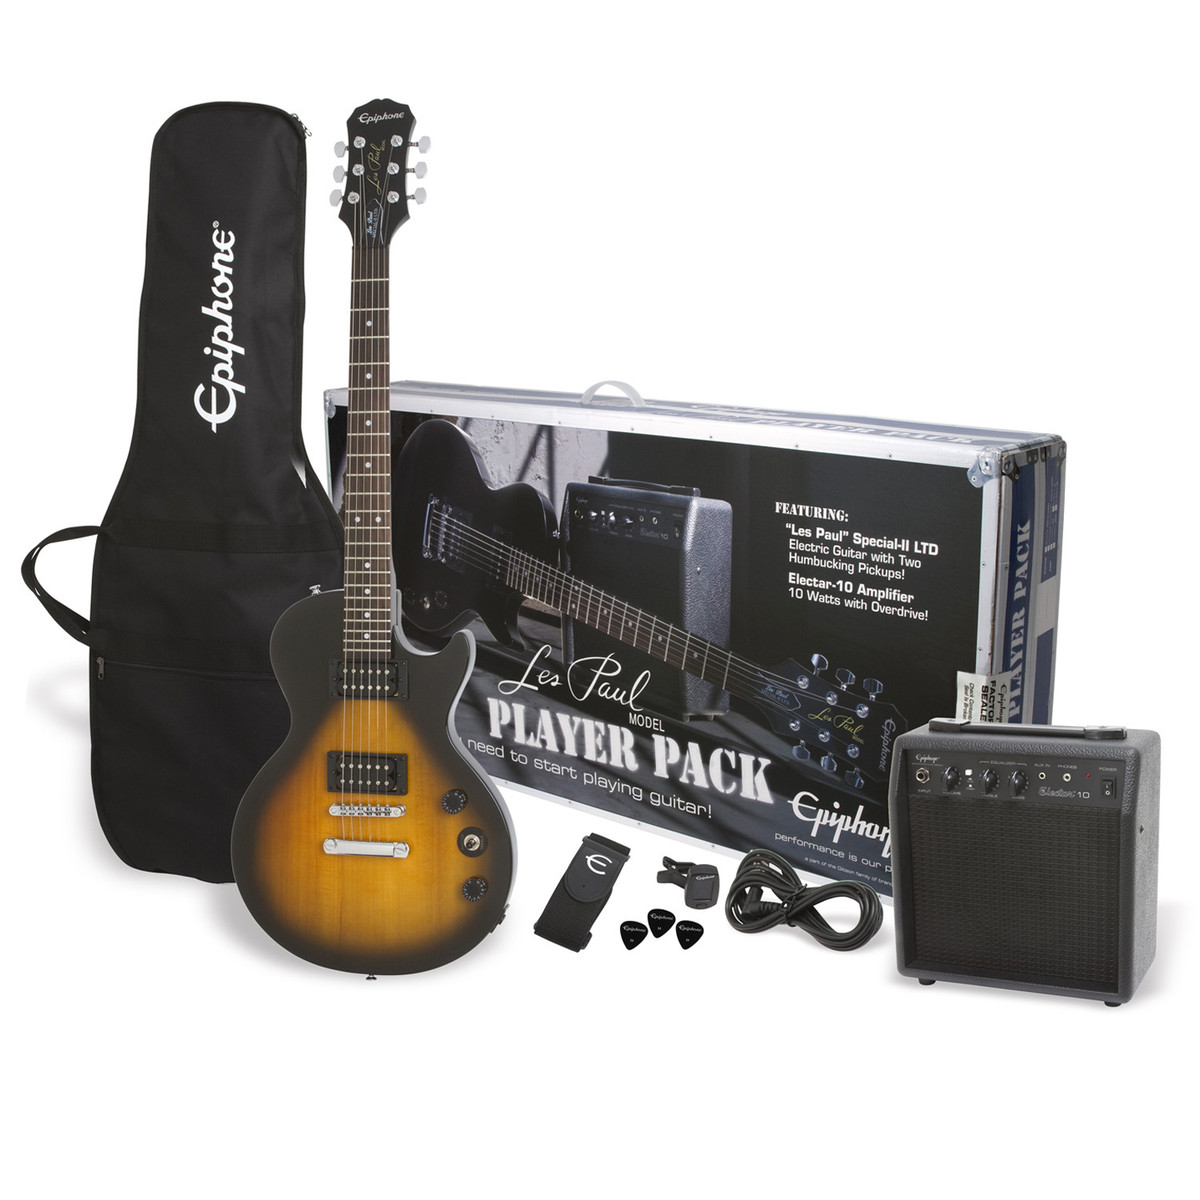 epiphone les paul electric guitar player pack vintage sunburst box opened at. Black Bedroom Furniture Sets. Home Design Ideas